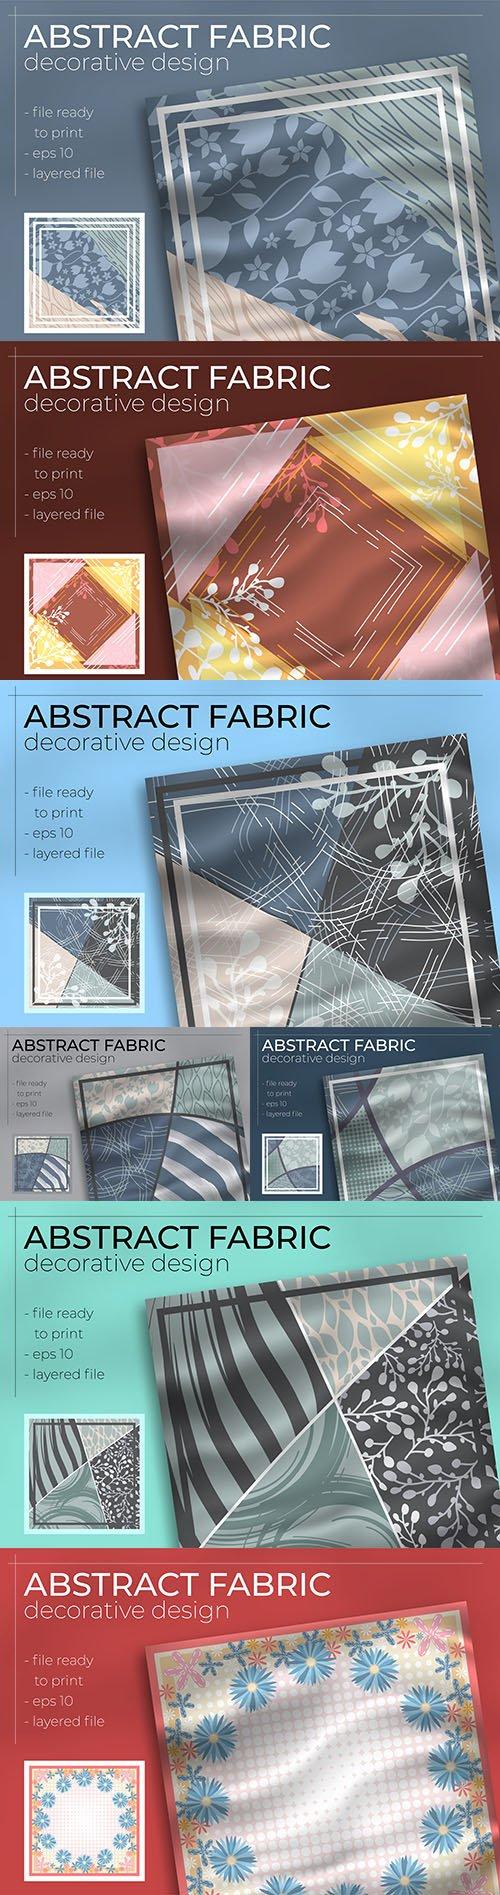 Decorative abstract realistic fabric design